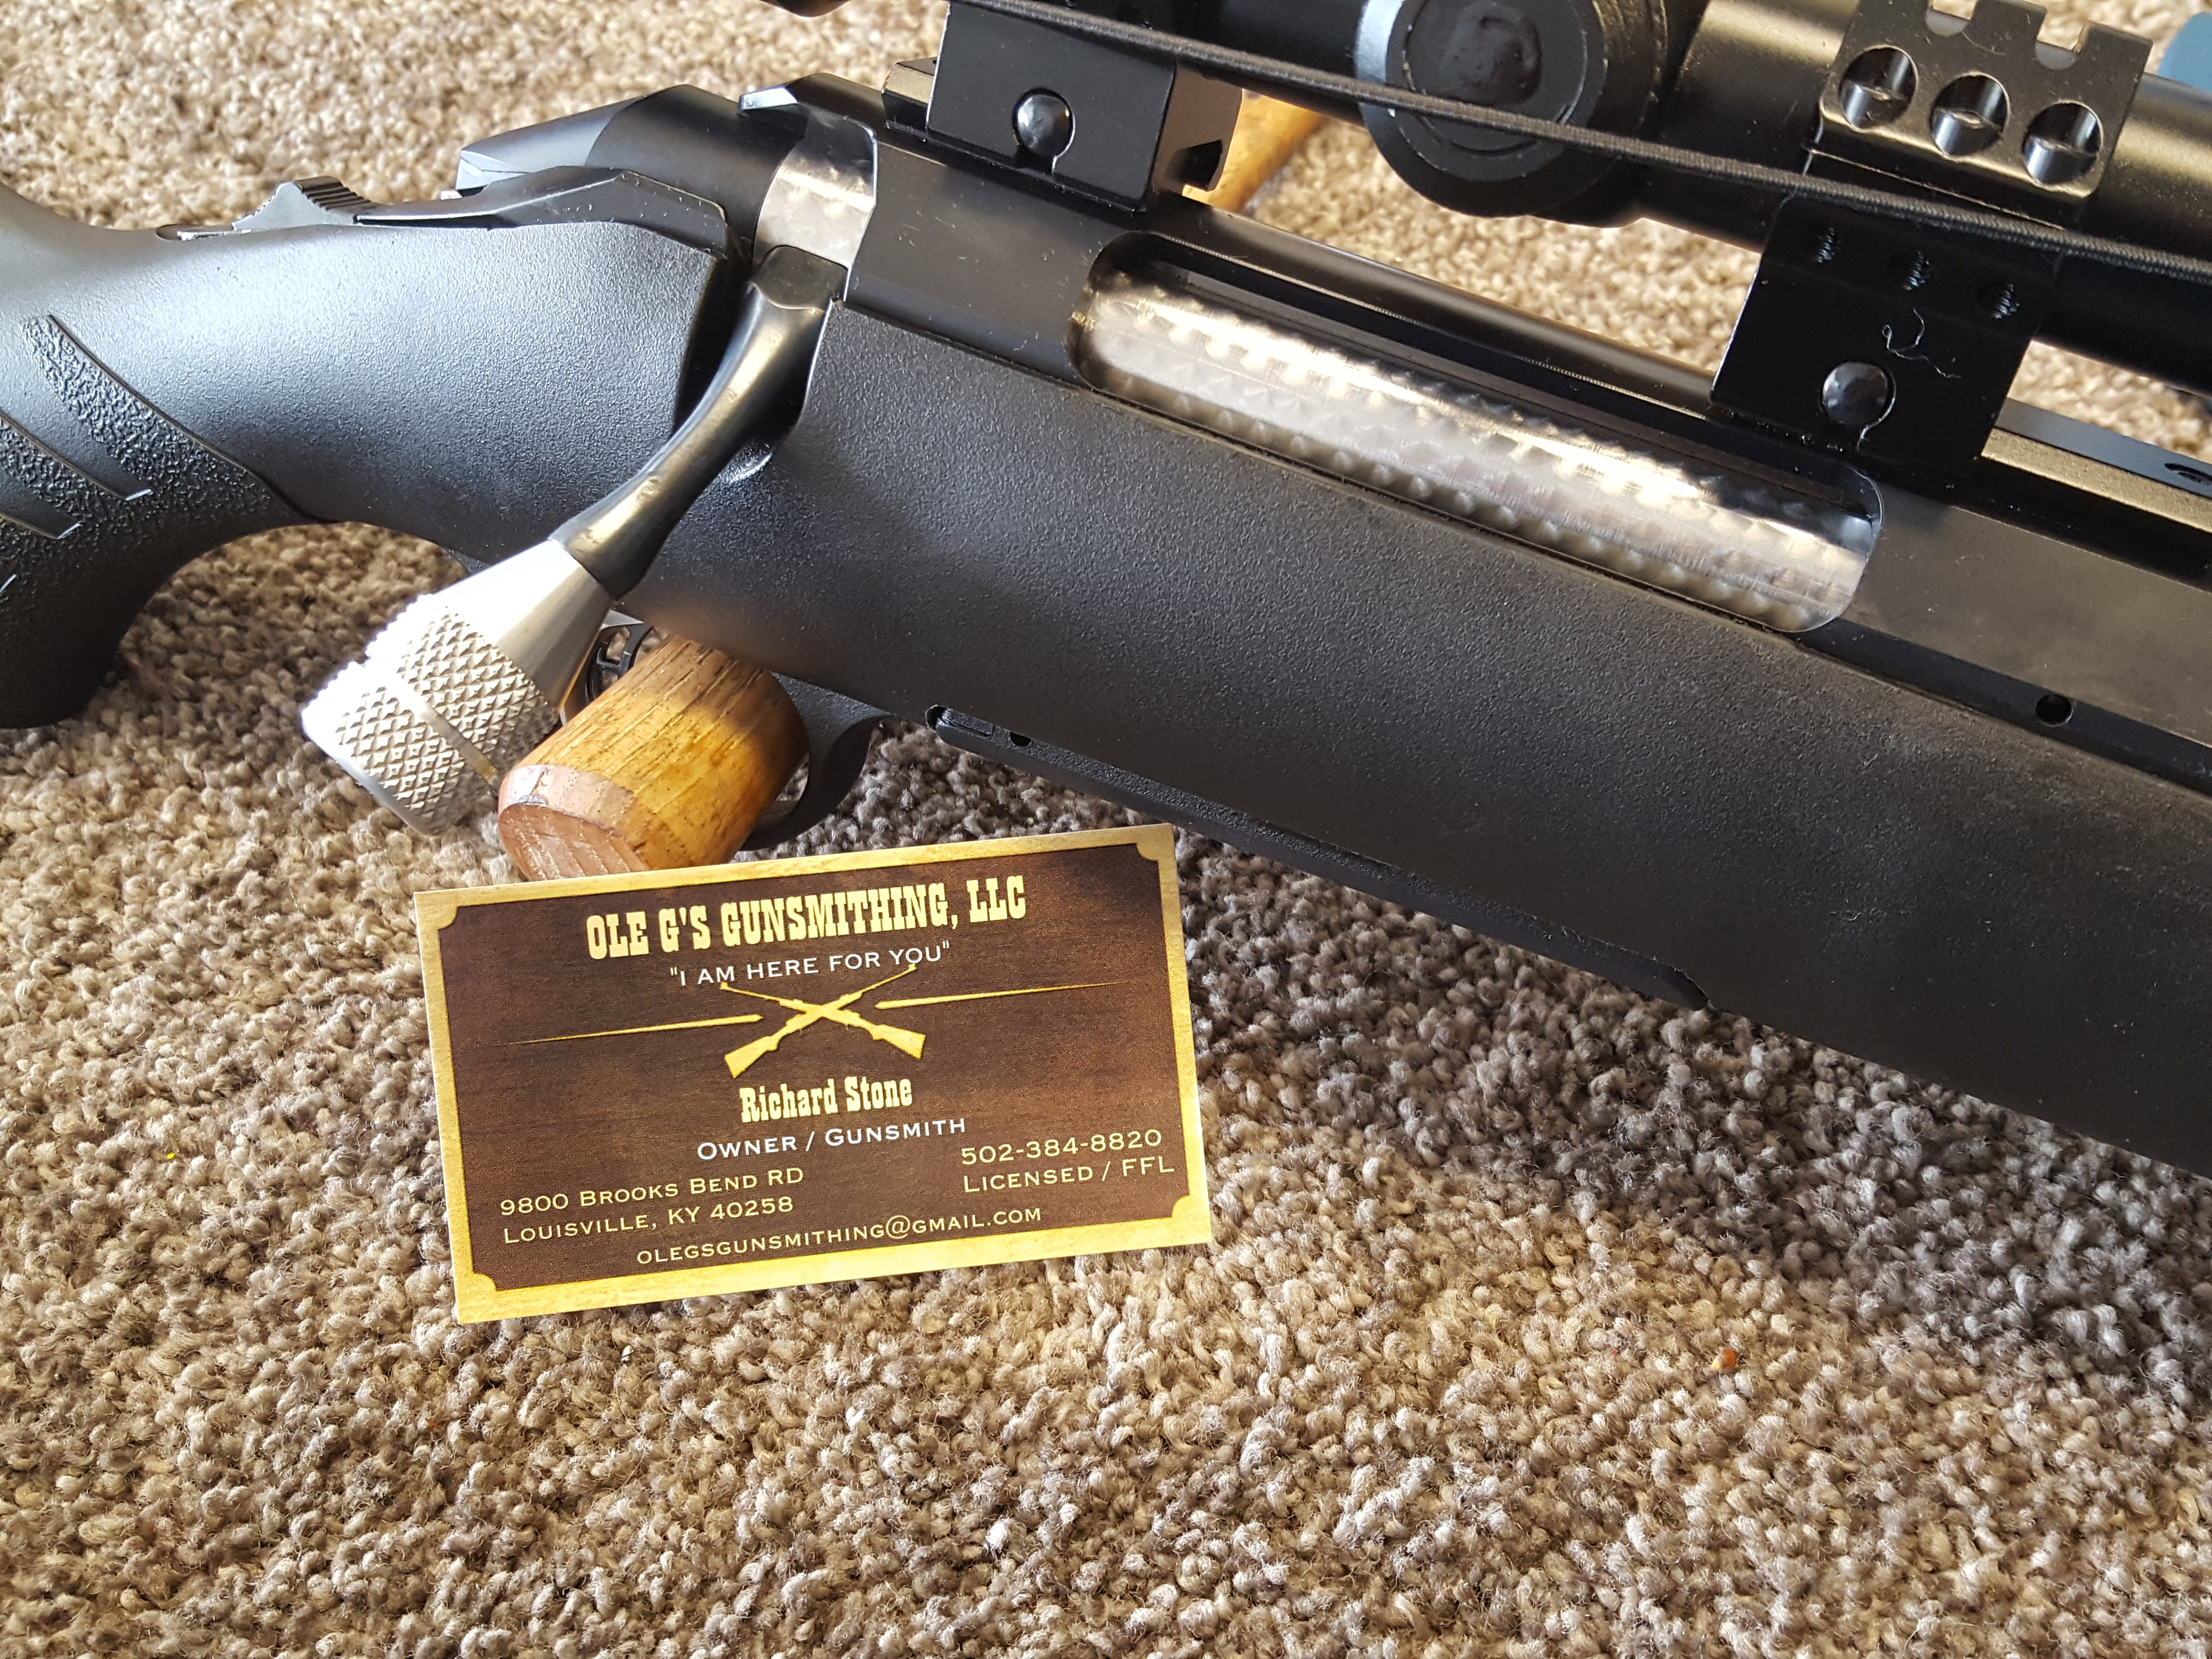 Ole G\'s Gunsmithing 9800 Brooks Bend RD, Louisville, KY 40258 - YP.com